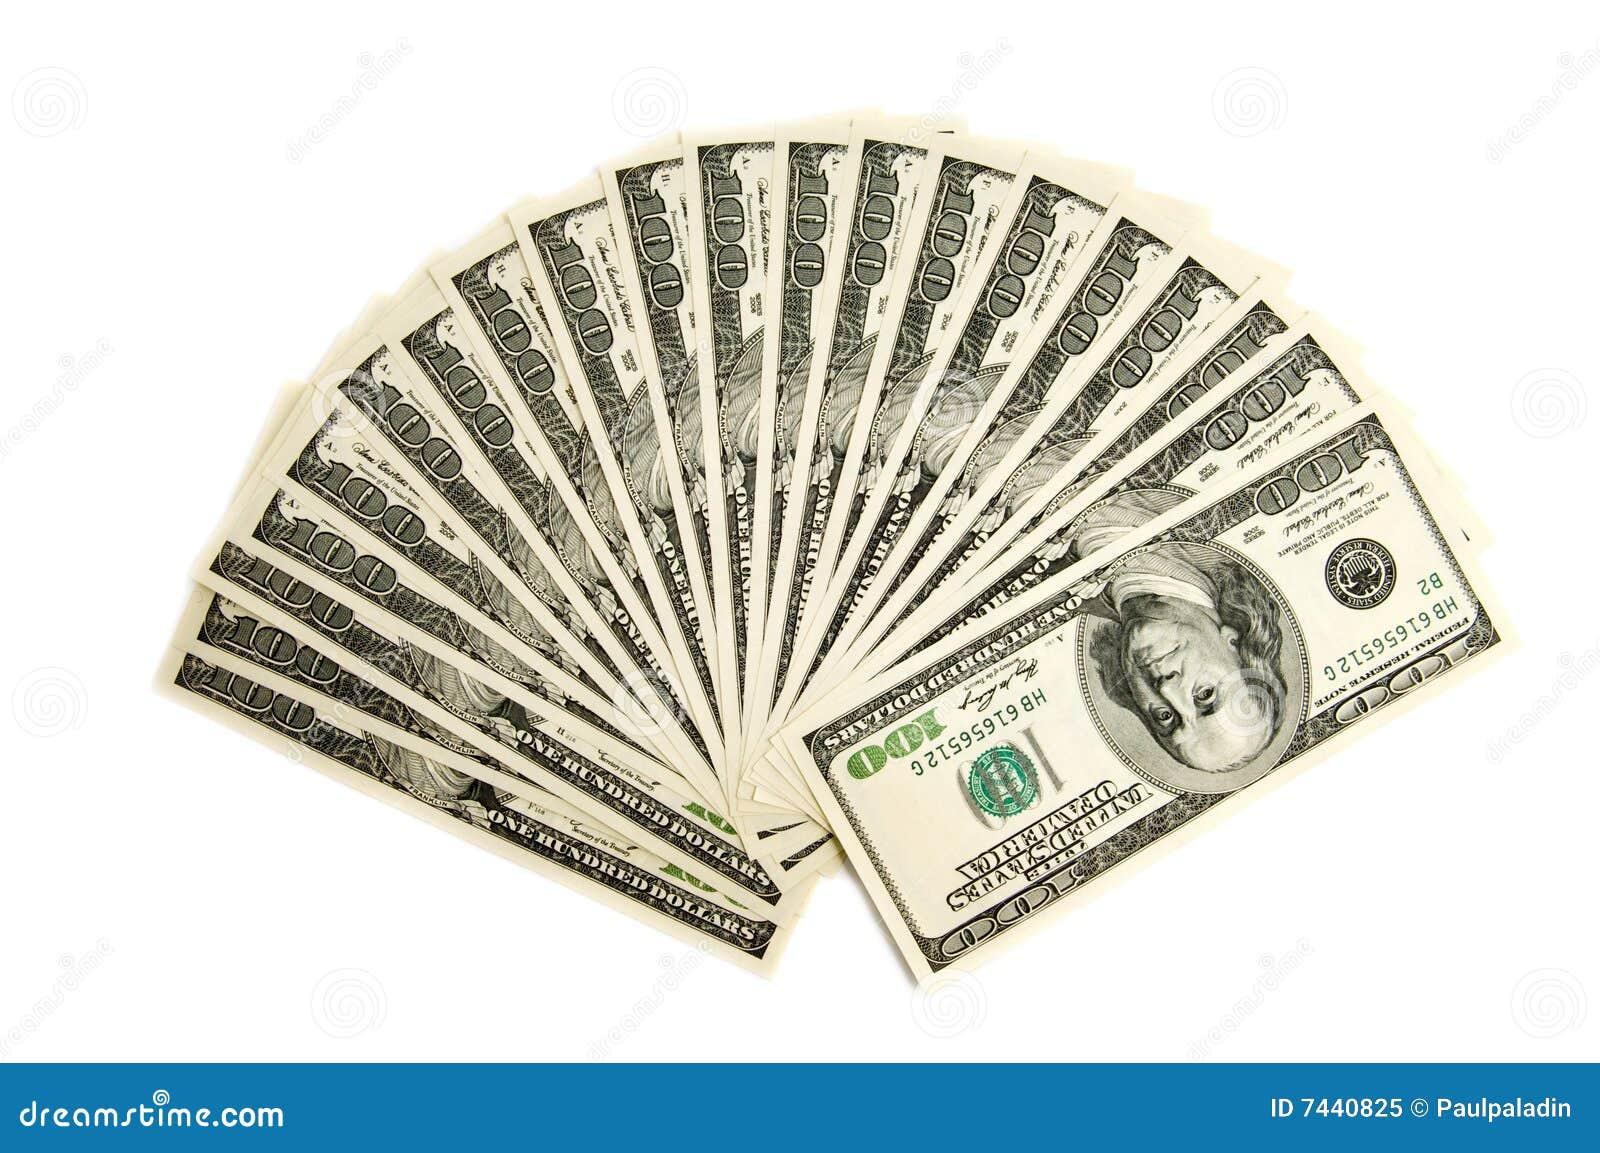 slang term for american paper dollar